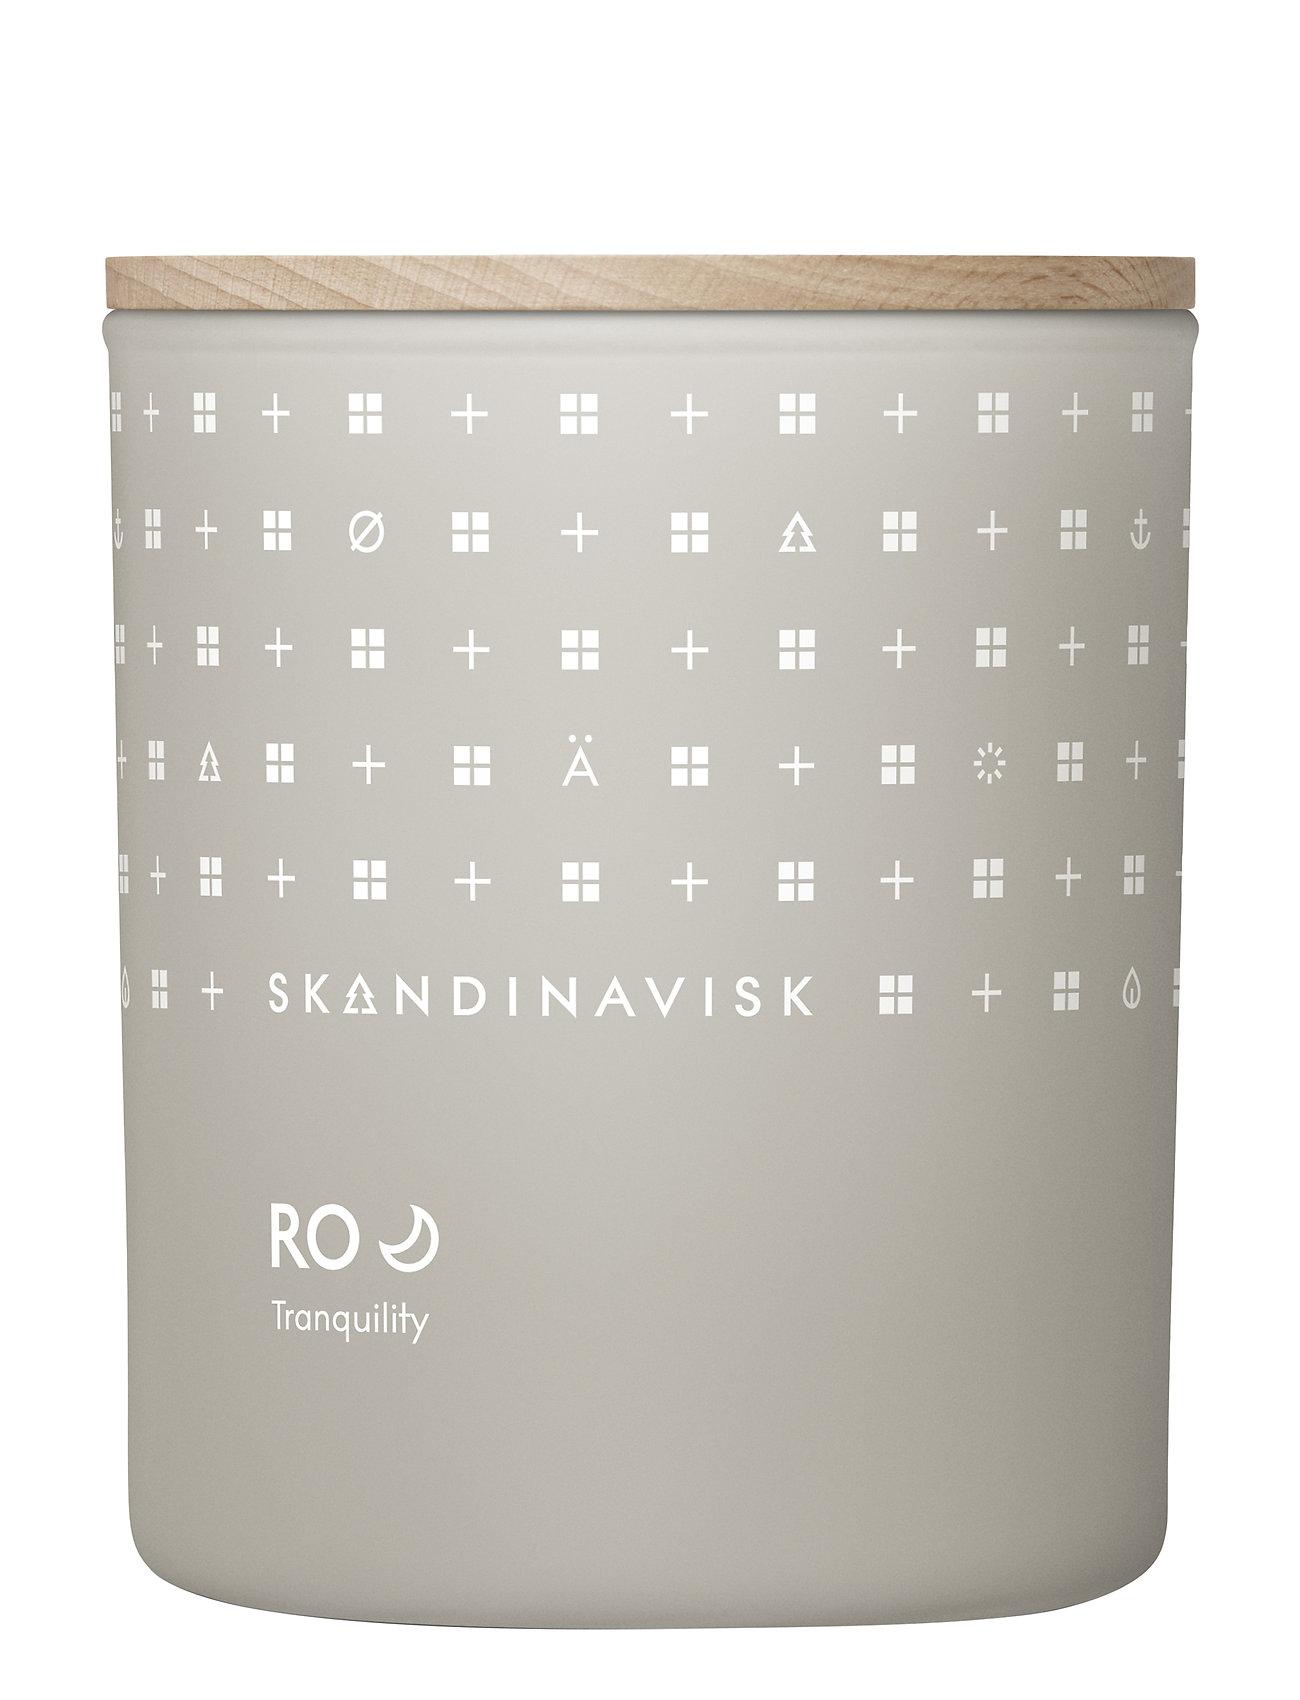 Skandinavisk Ro Scented Candle With Lid 200g Tuoksukynttilä Nude Skandinavisk